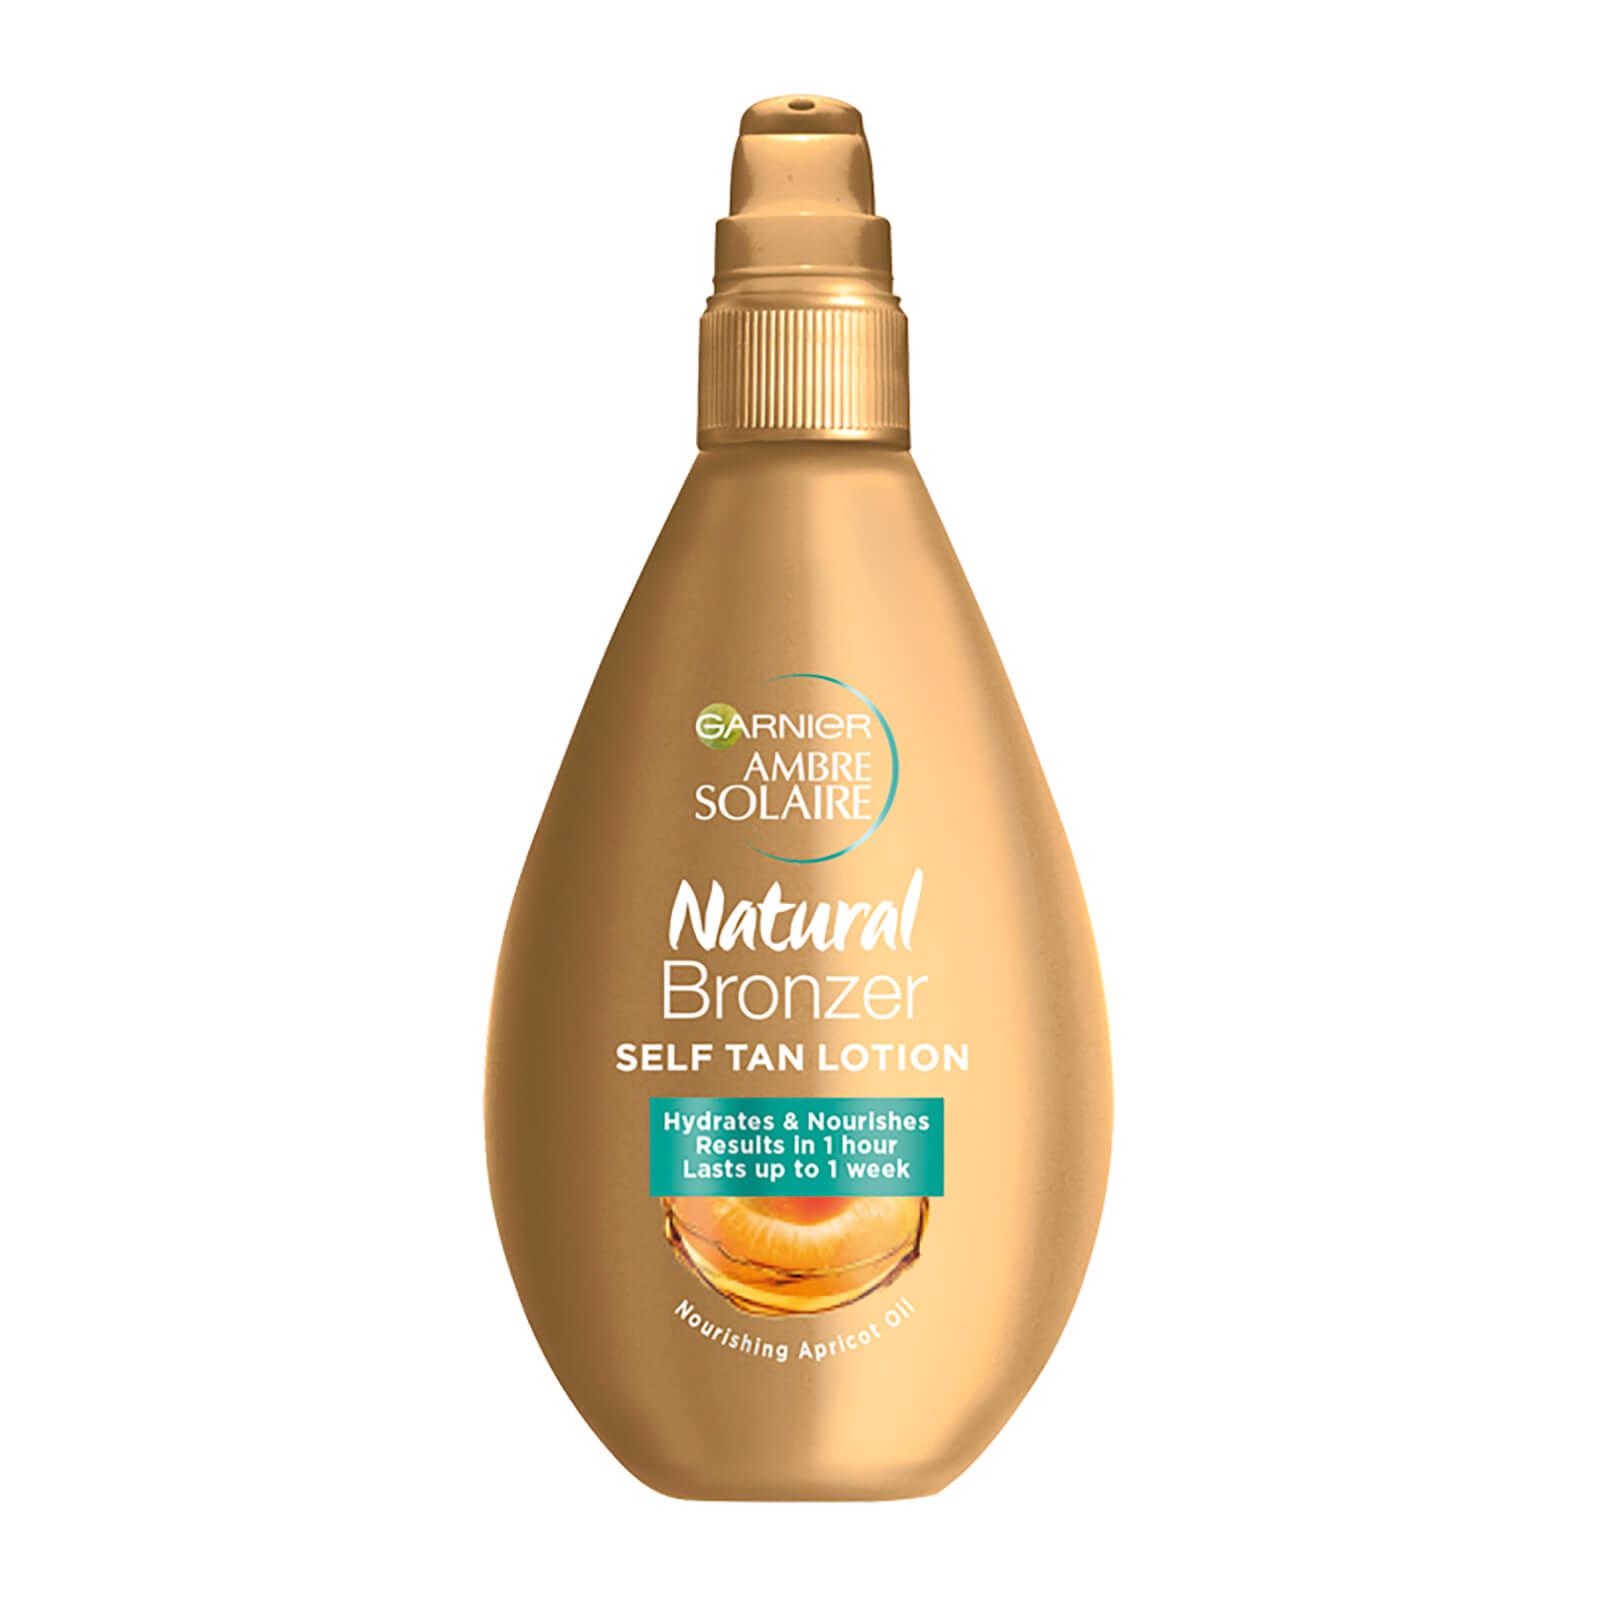 ambre solaire natural bronzer self tan lotion 150ml